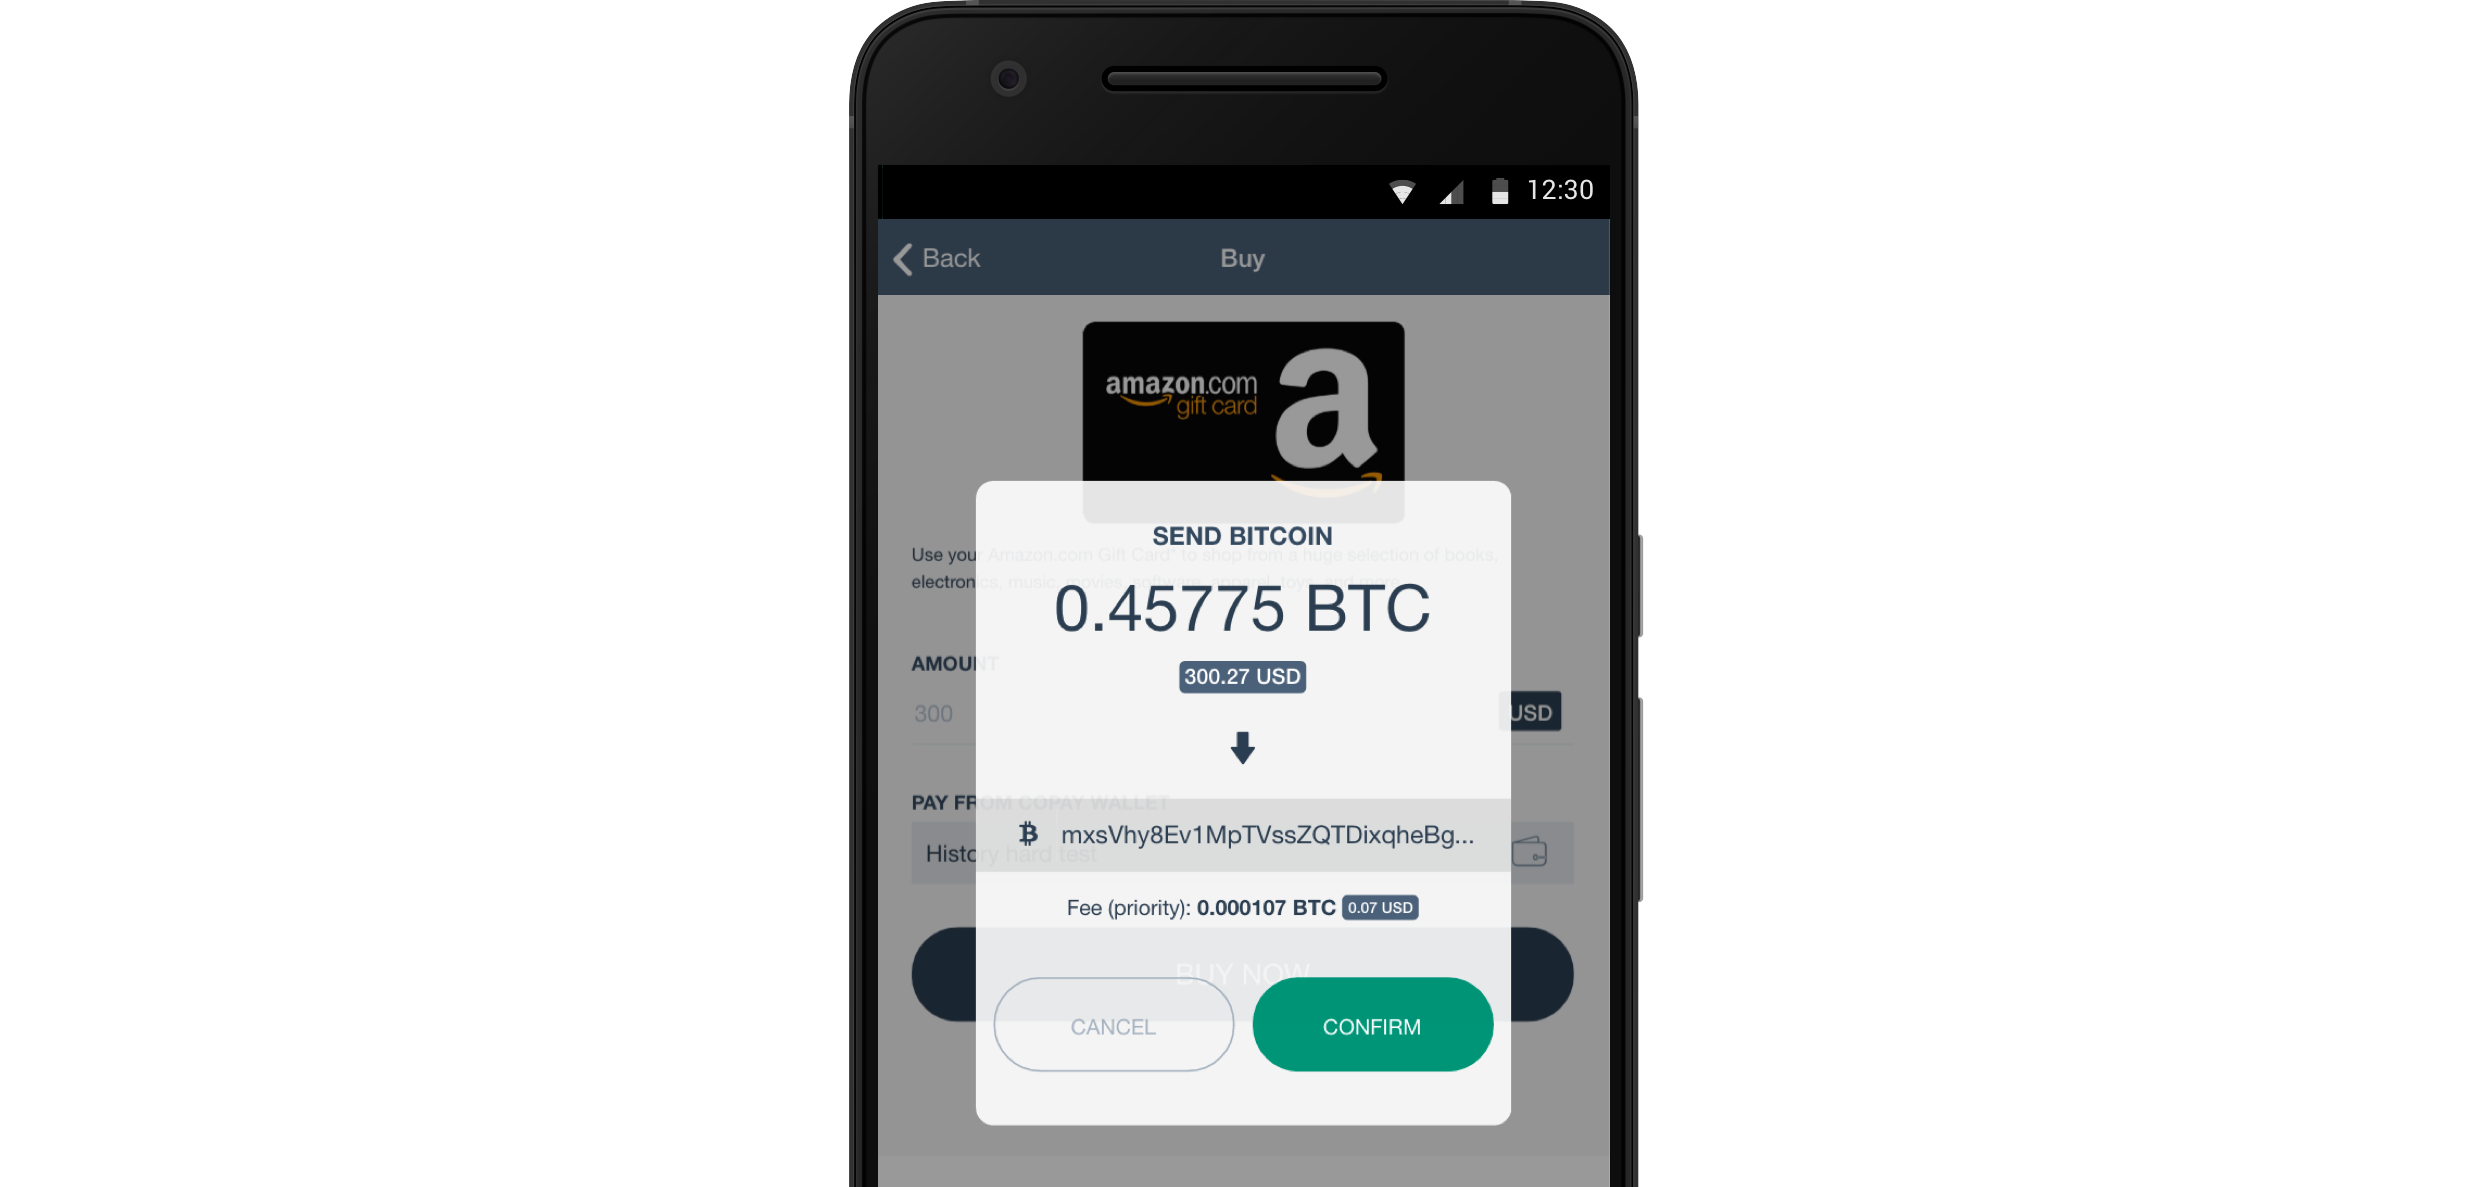 Buy Flipkart Gift Card With Bitcoin